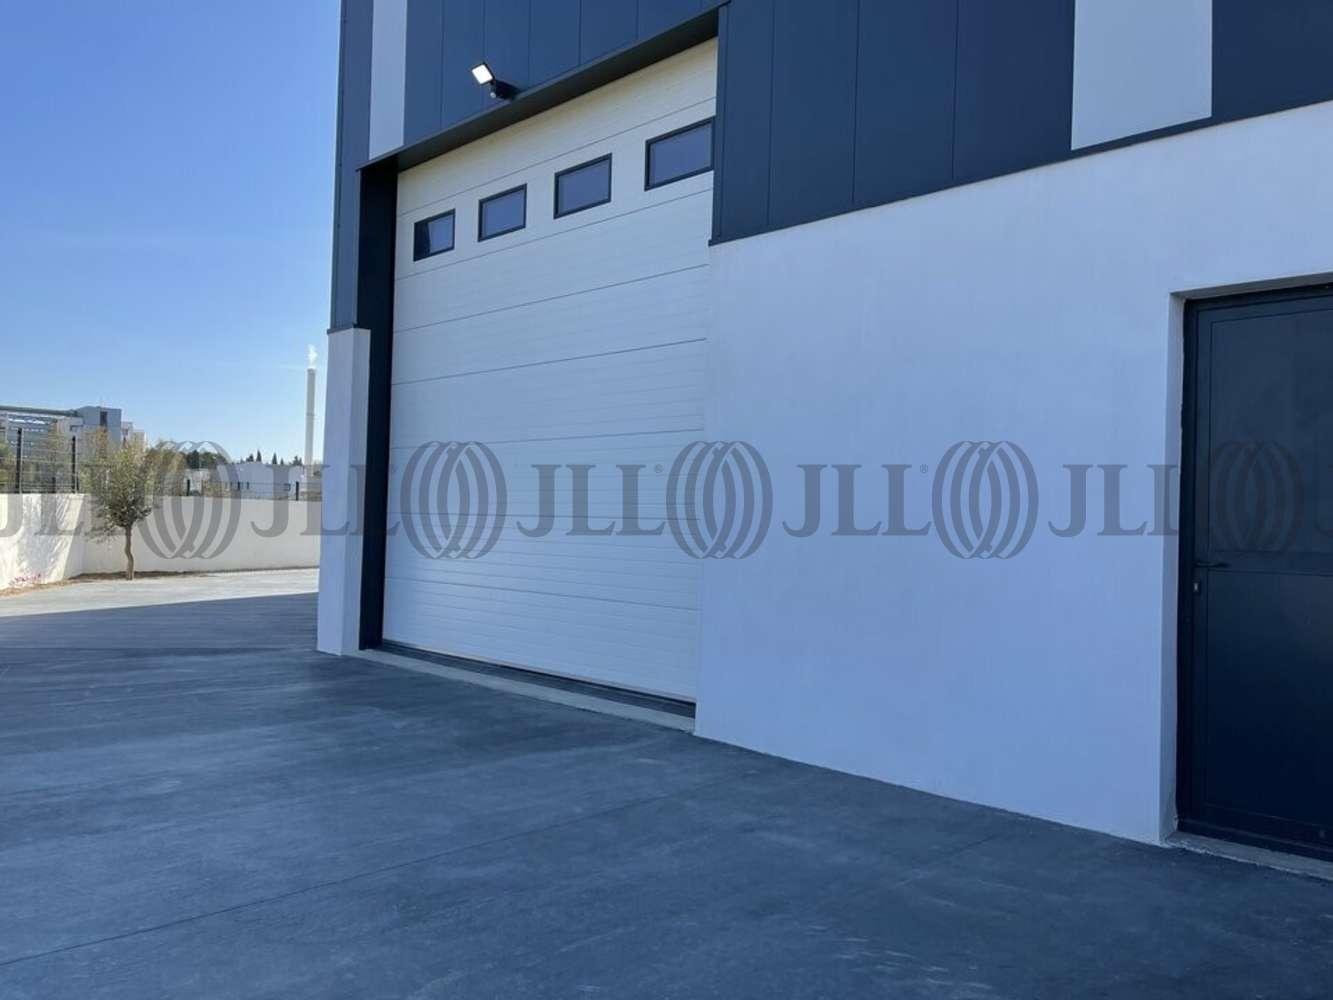 Activités/entrepôt Montpellier, 34000